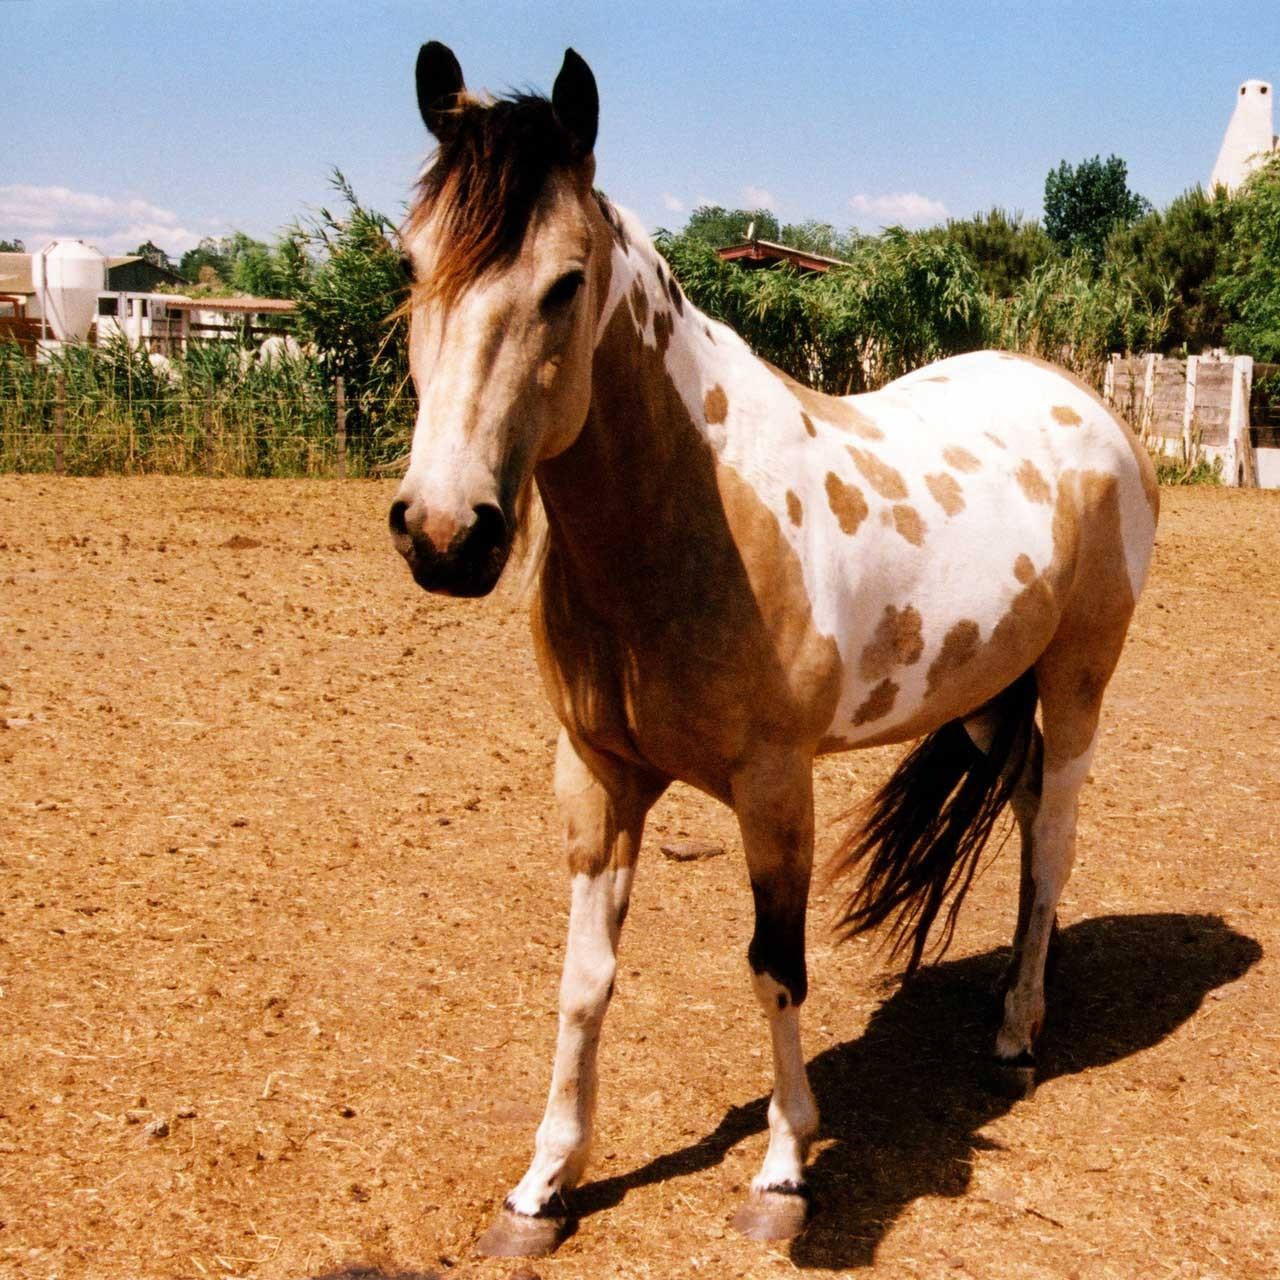 Laure-Maud_photographe_14_chevaux-camarguais_03